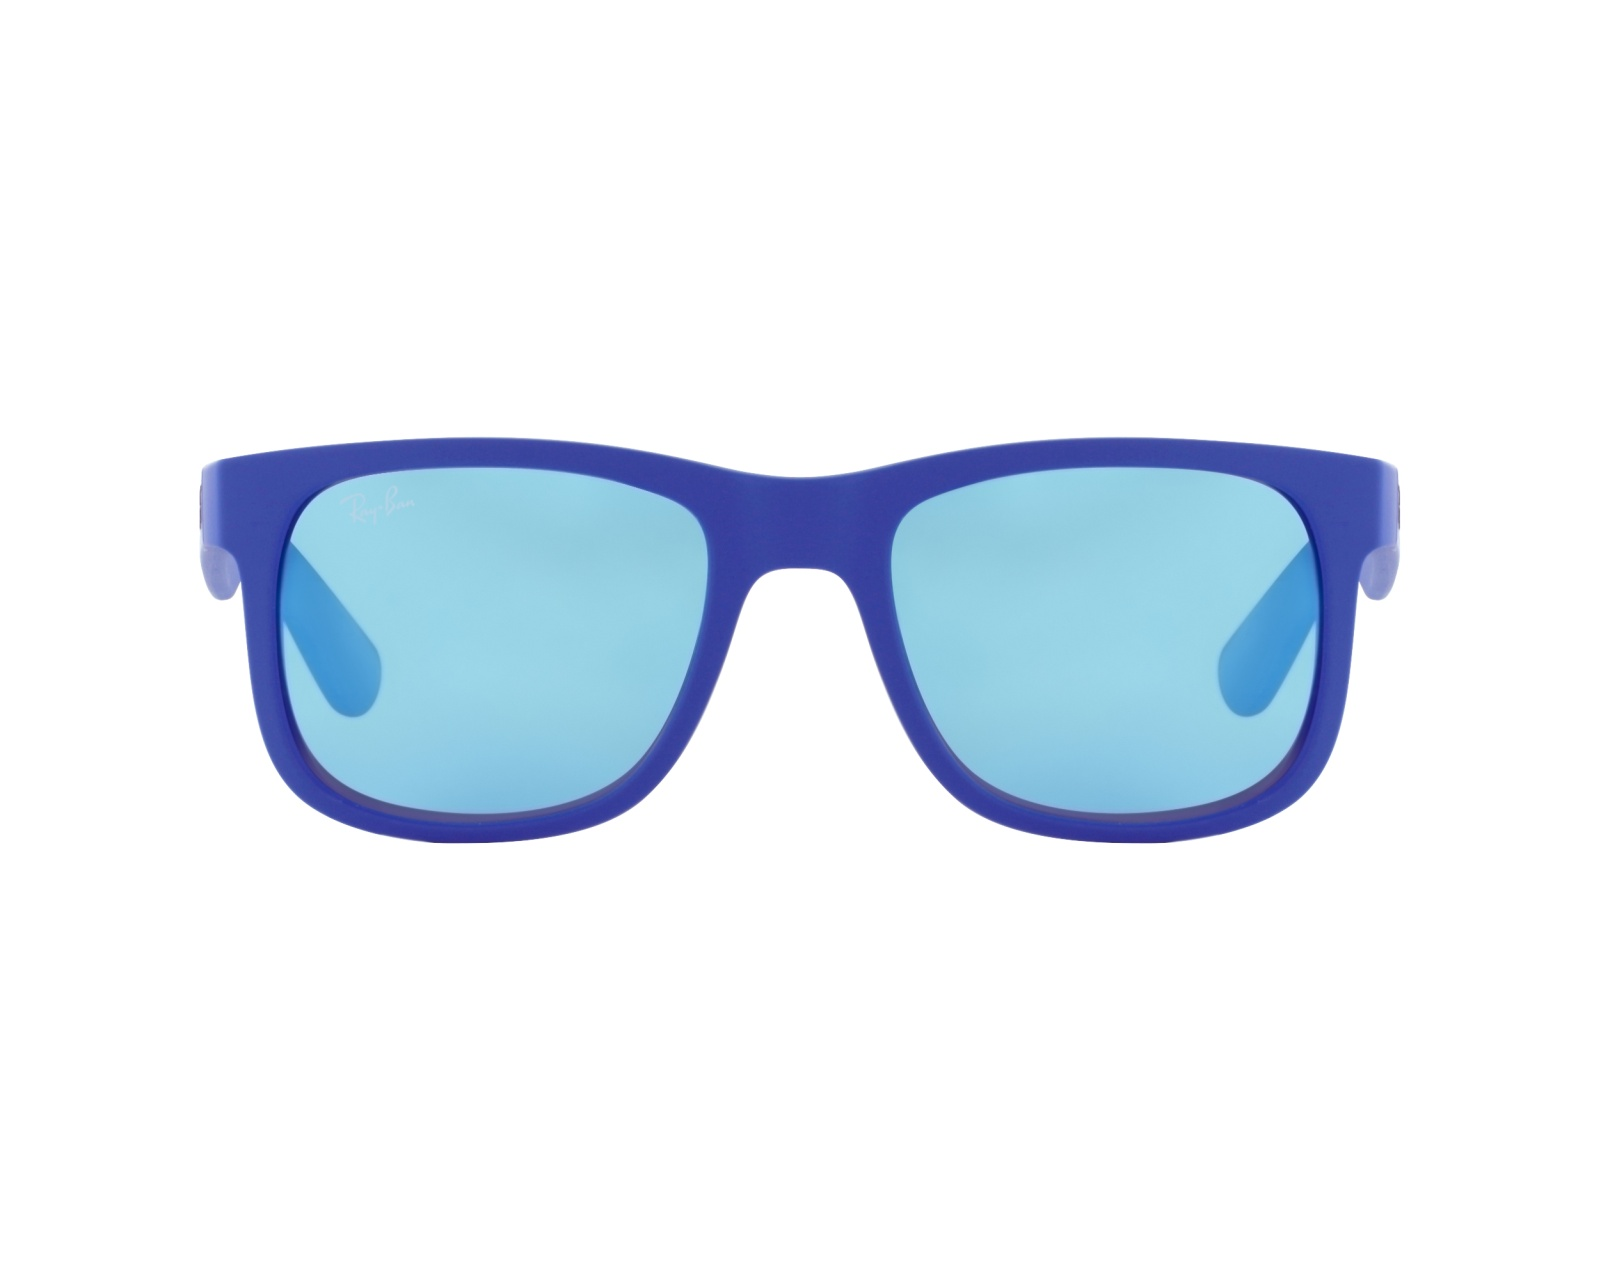 lunette ray ban justin psychopraticienne bordeaux. Black Bedroom Furniture Sets. Home Design Ideas